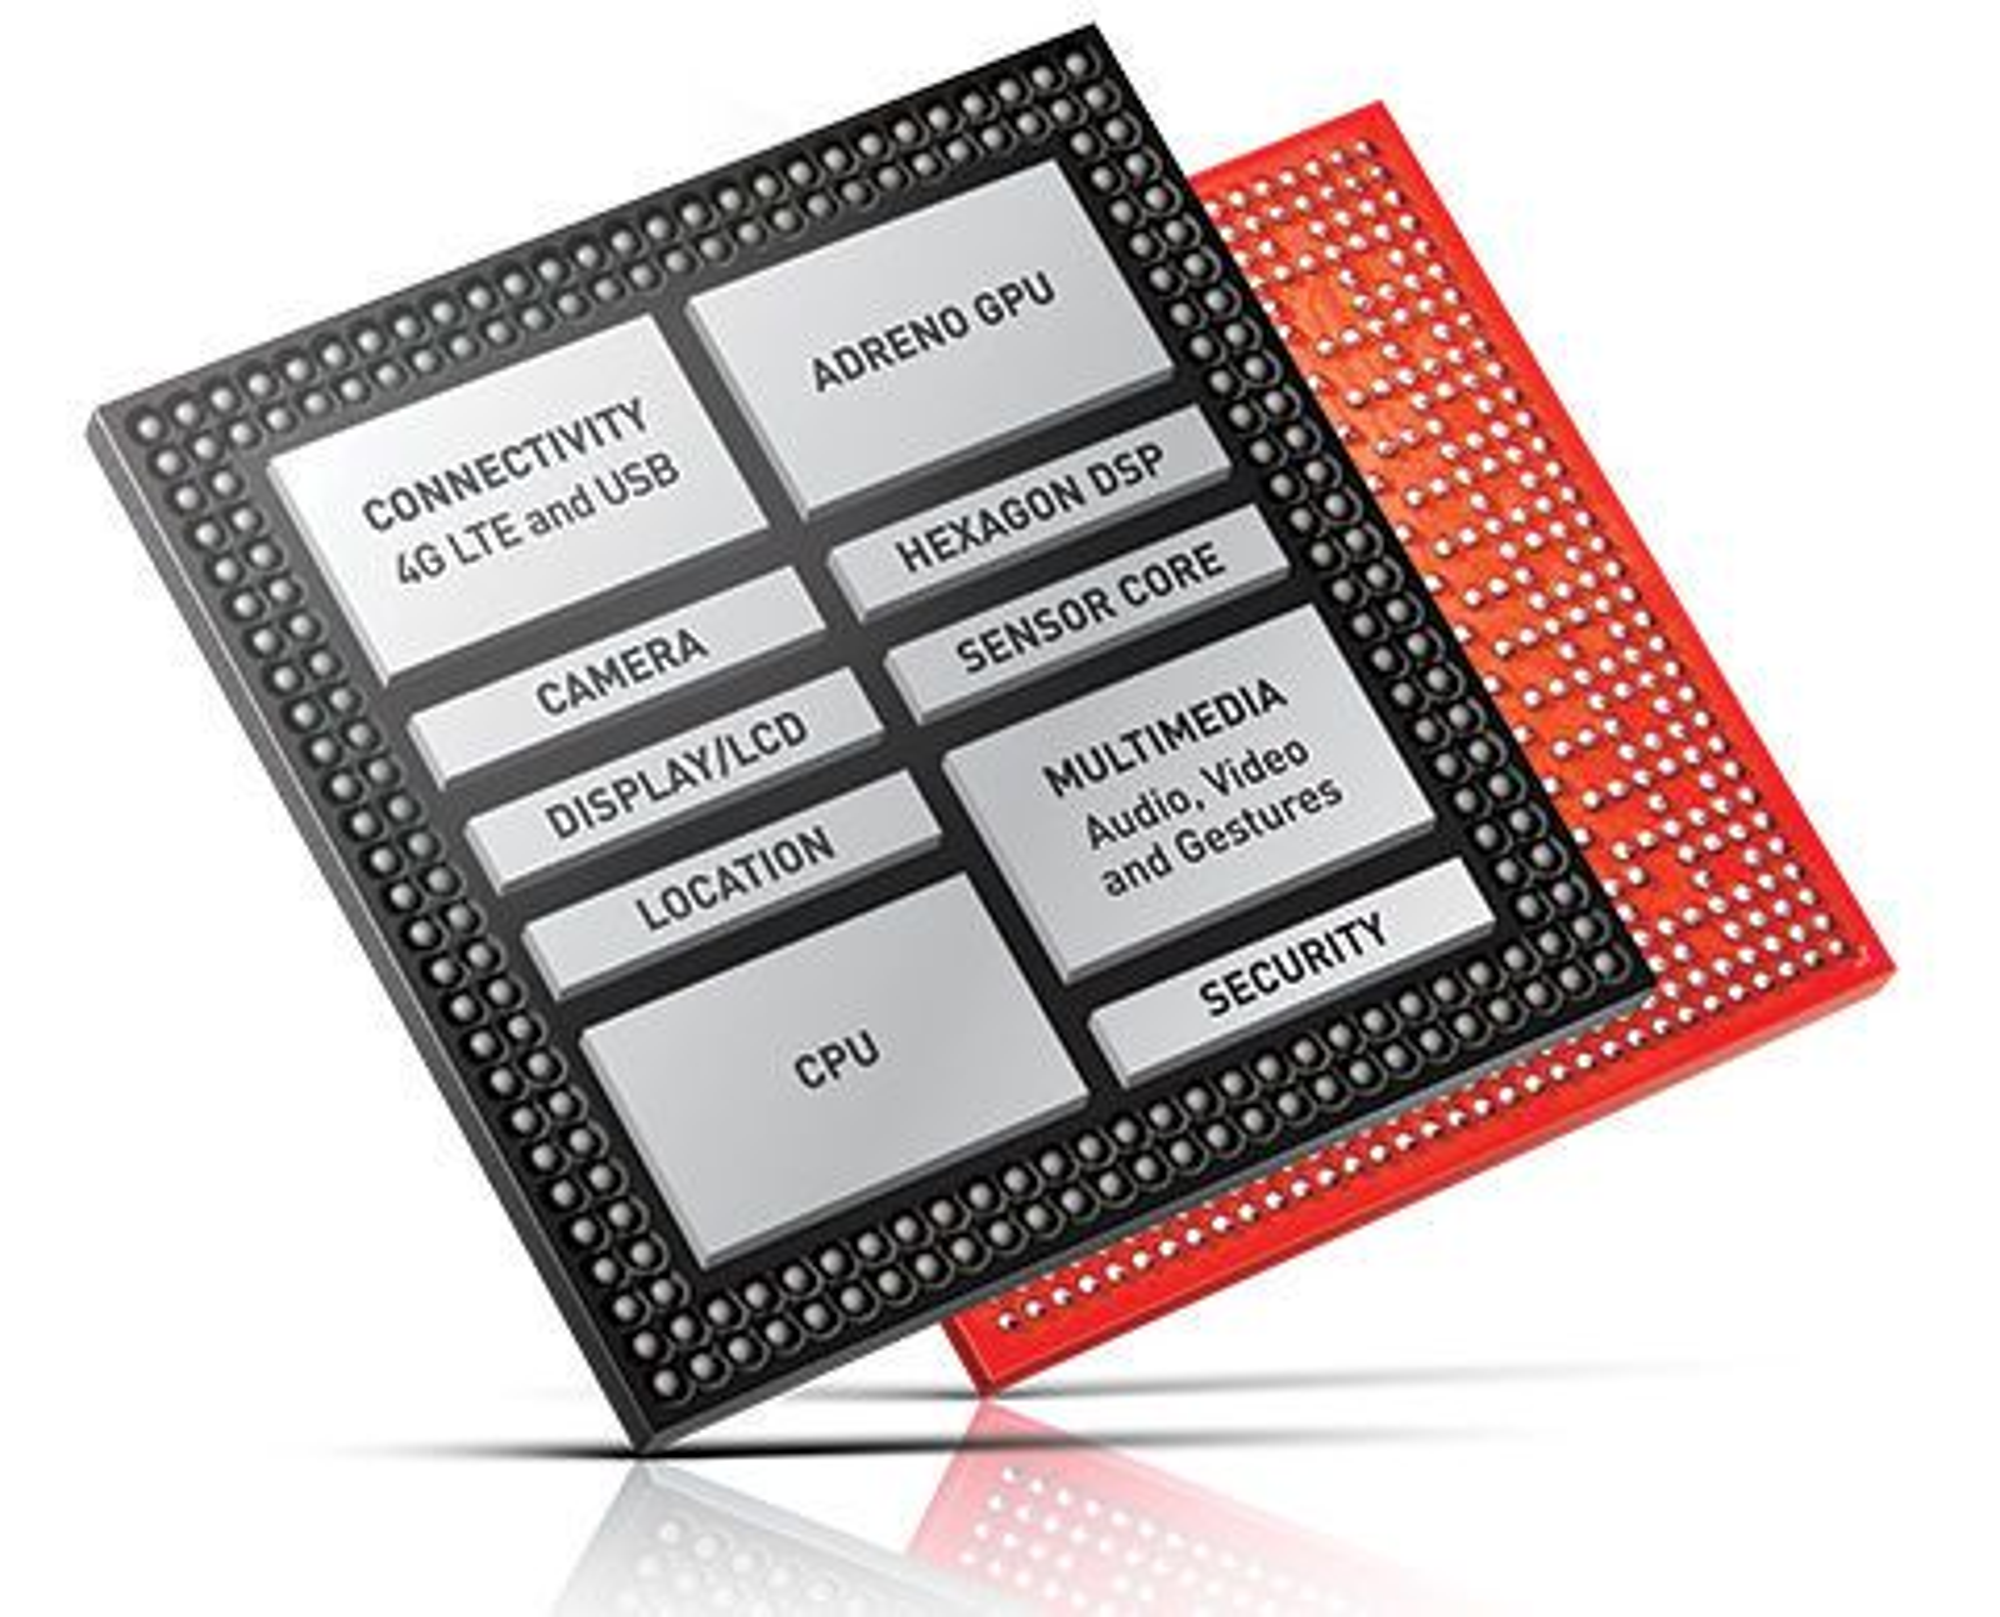 De viktigste komponentene i Snapdragon 810.